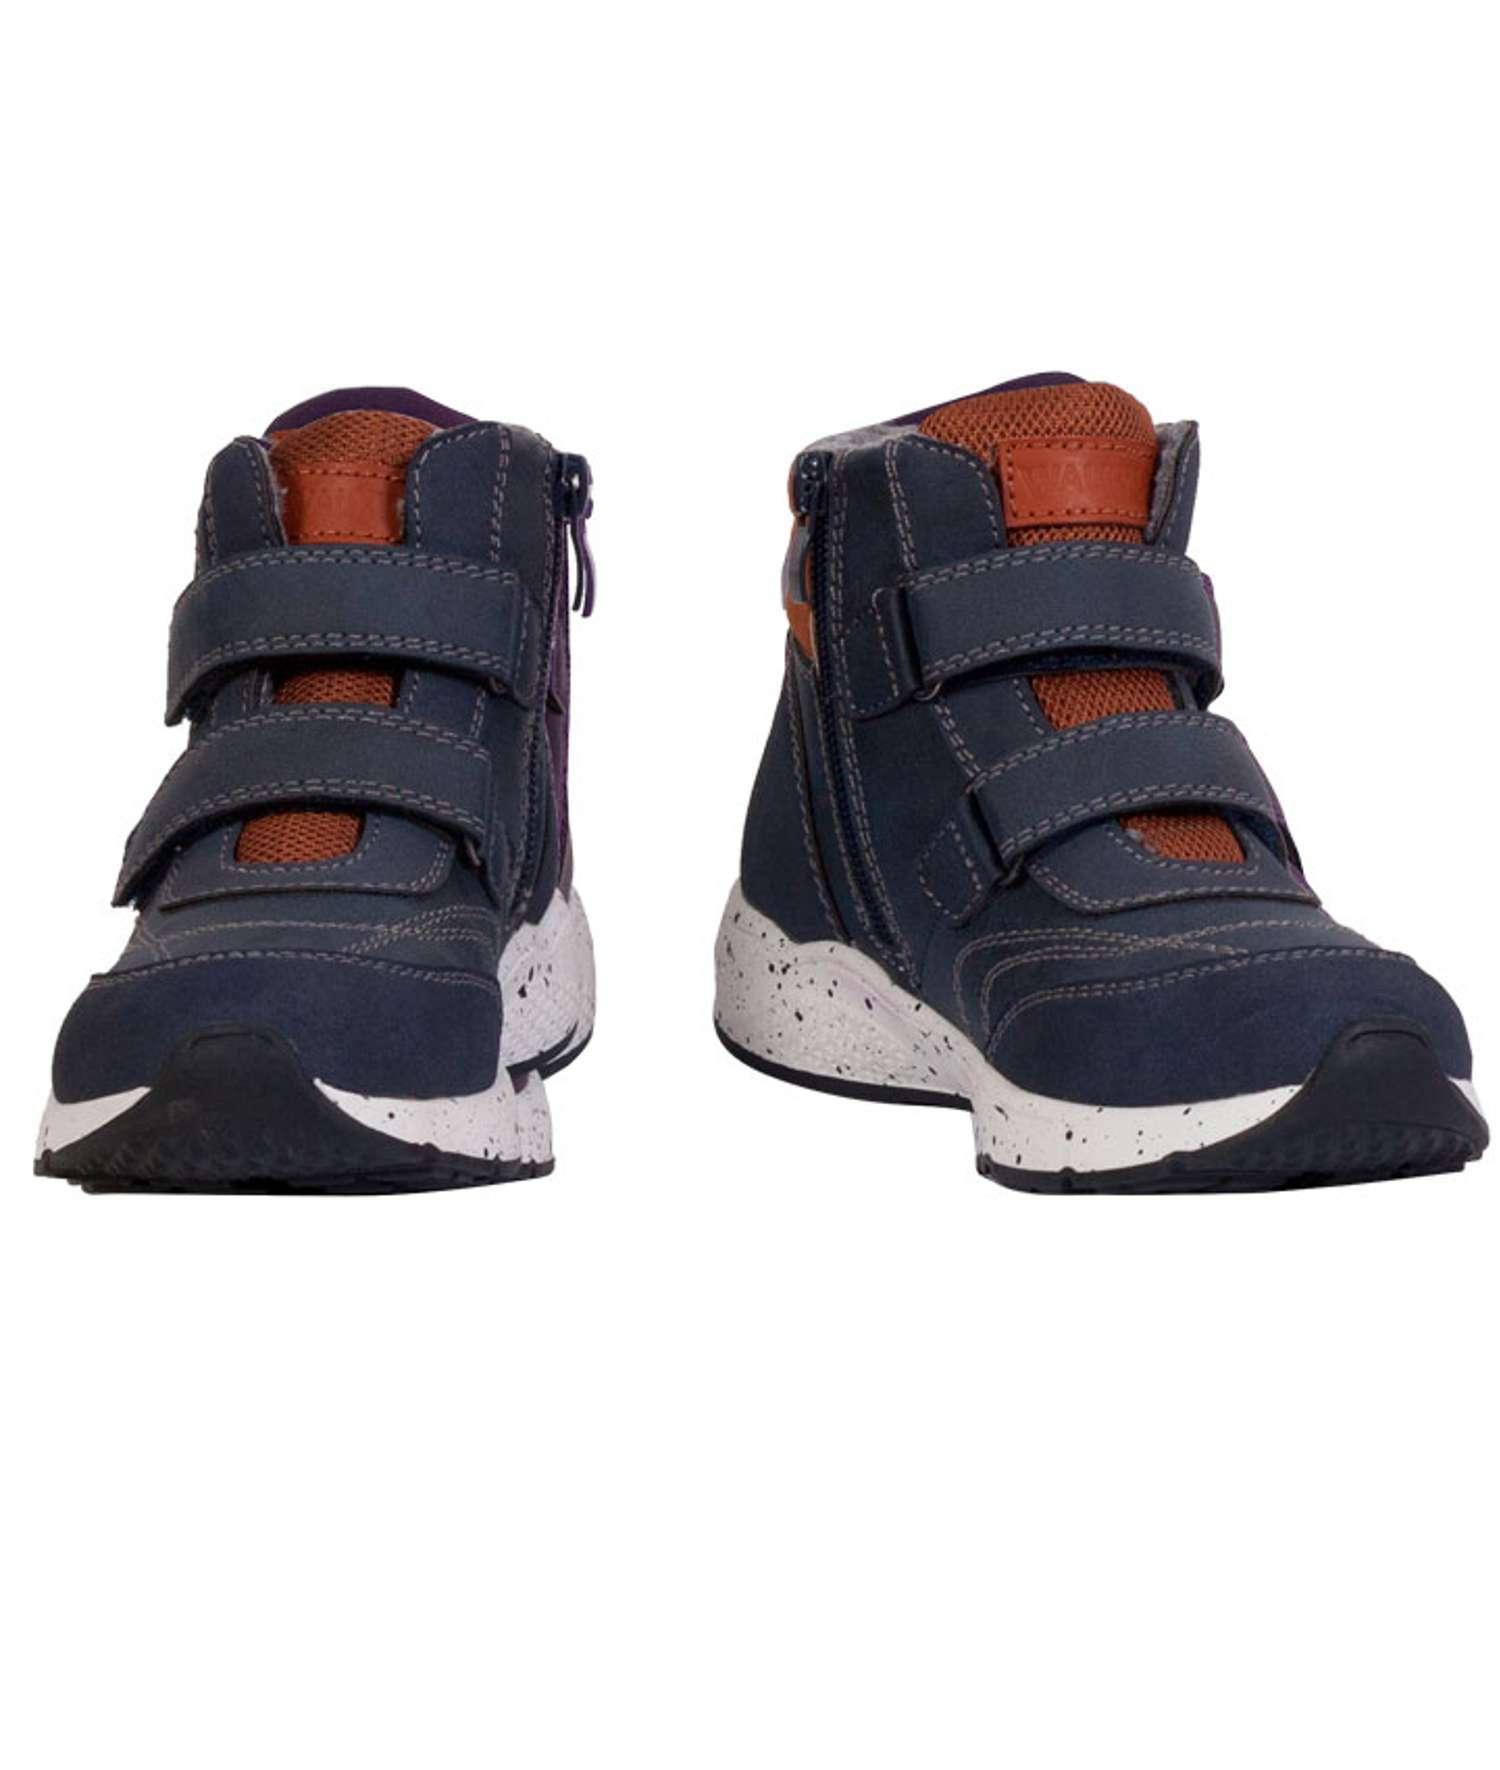 Walkway - Akako børne vinter sneakers - Mørkeblå - Størrelse 28